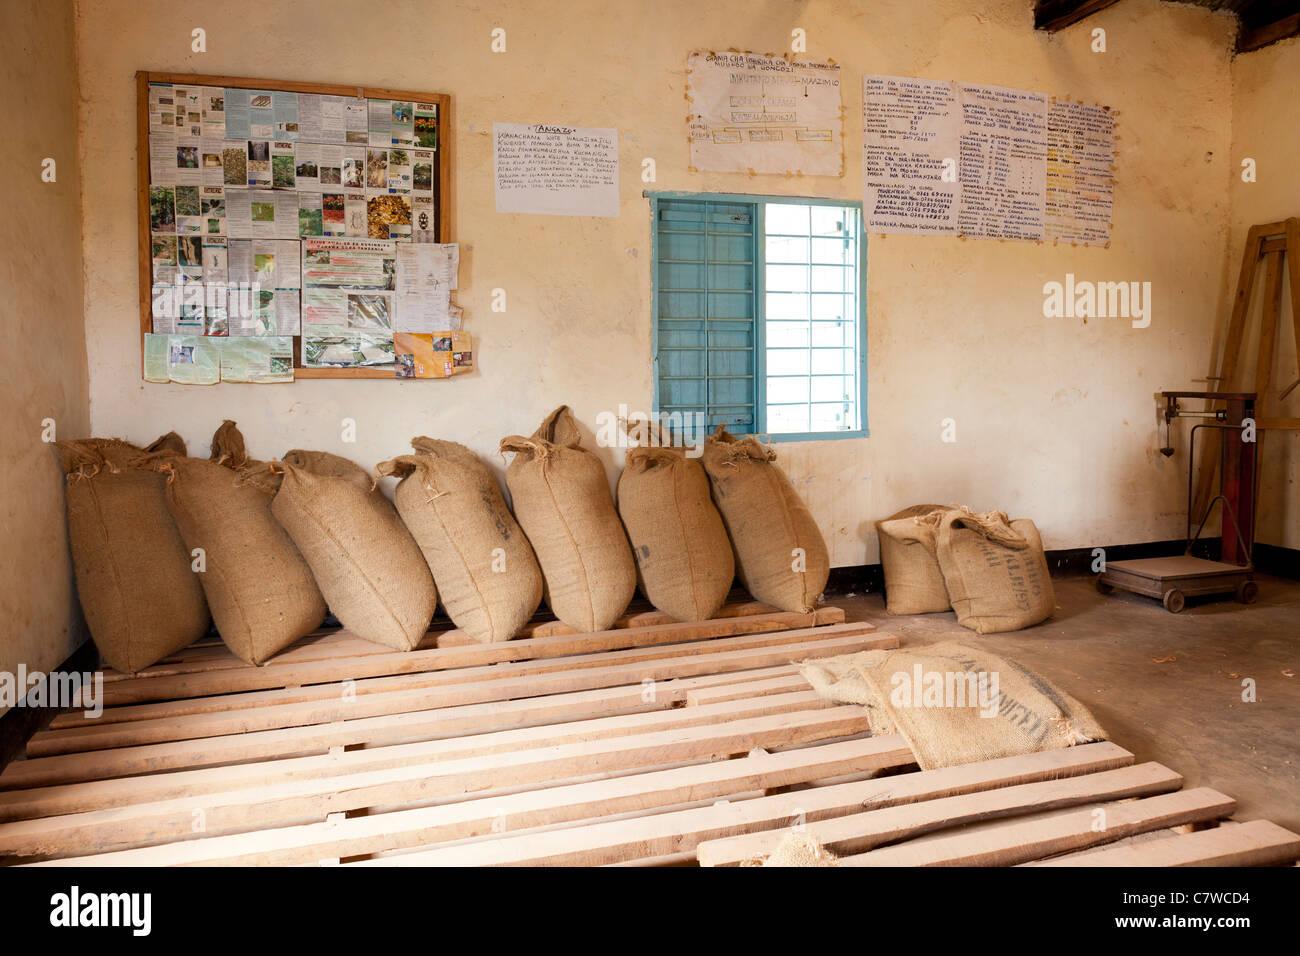 Sacks of coffee at the KNCU Mrimbo Uuwo Primary Society Office, Moshi, Tanzania - Stock Image